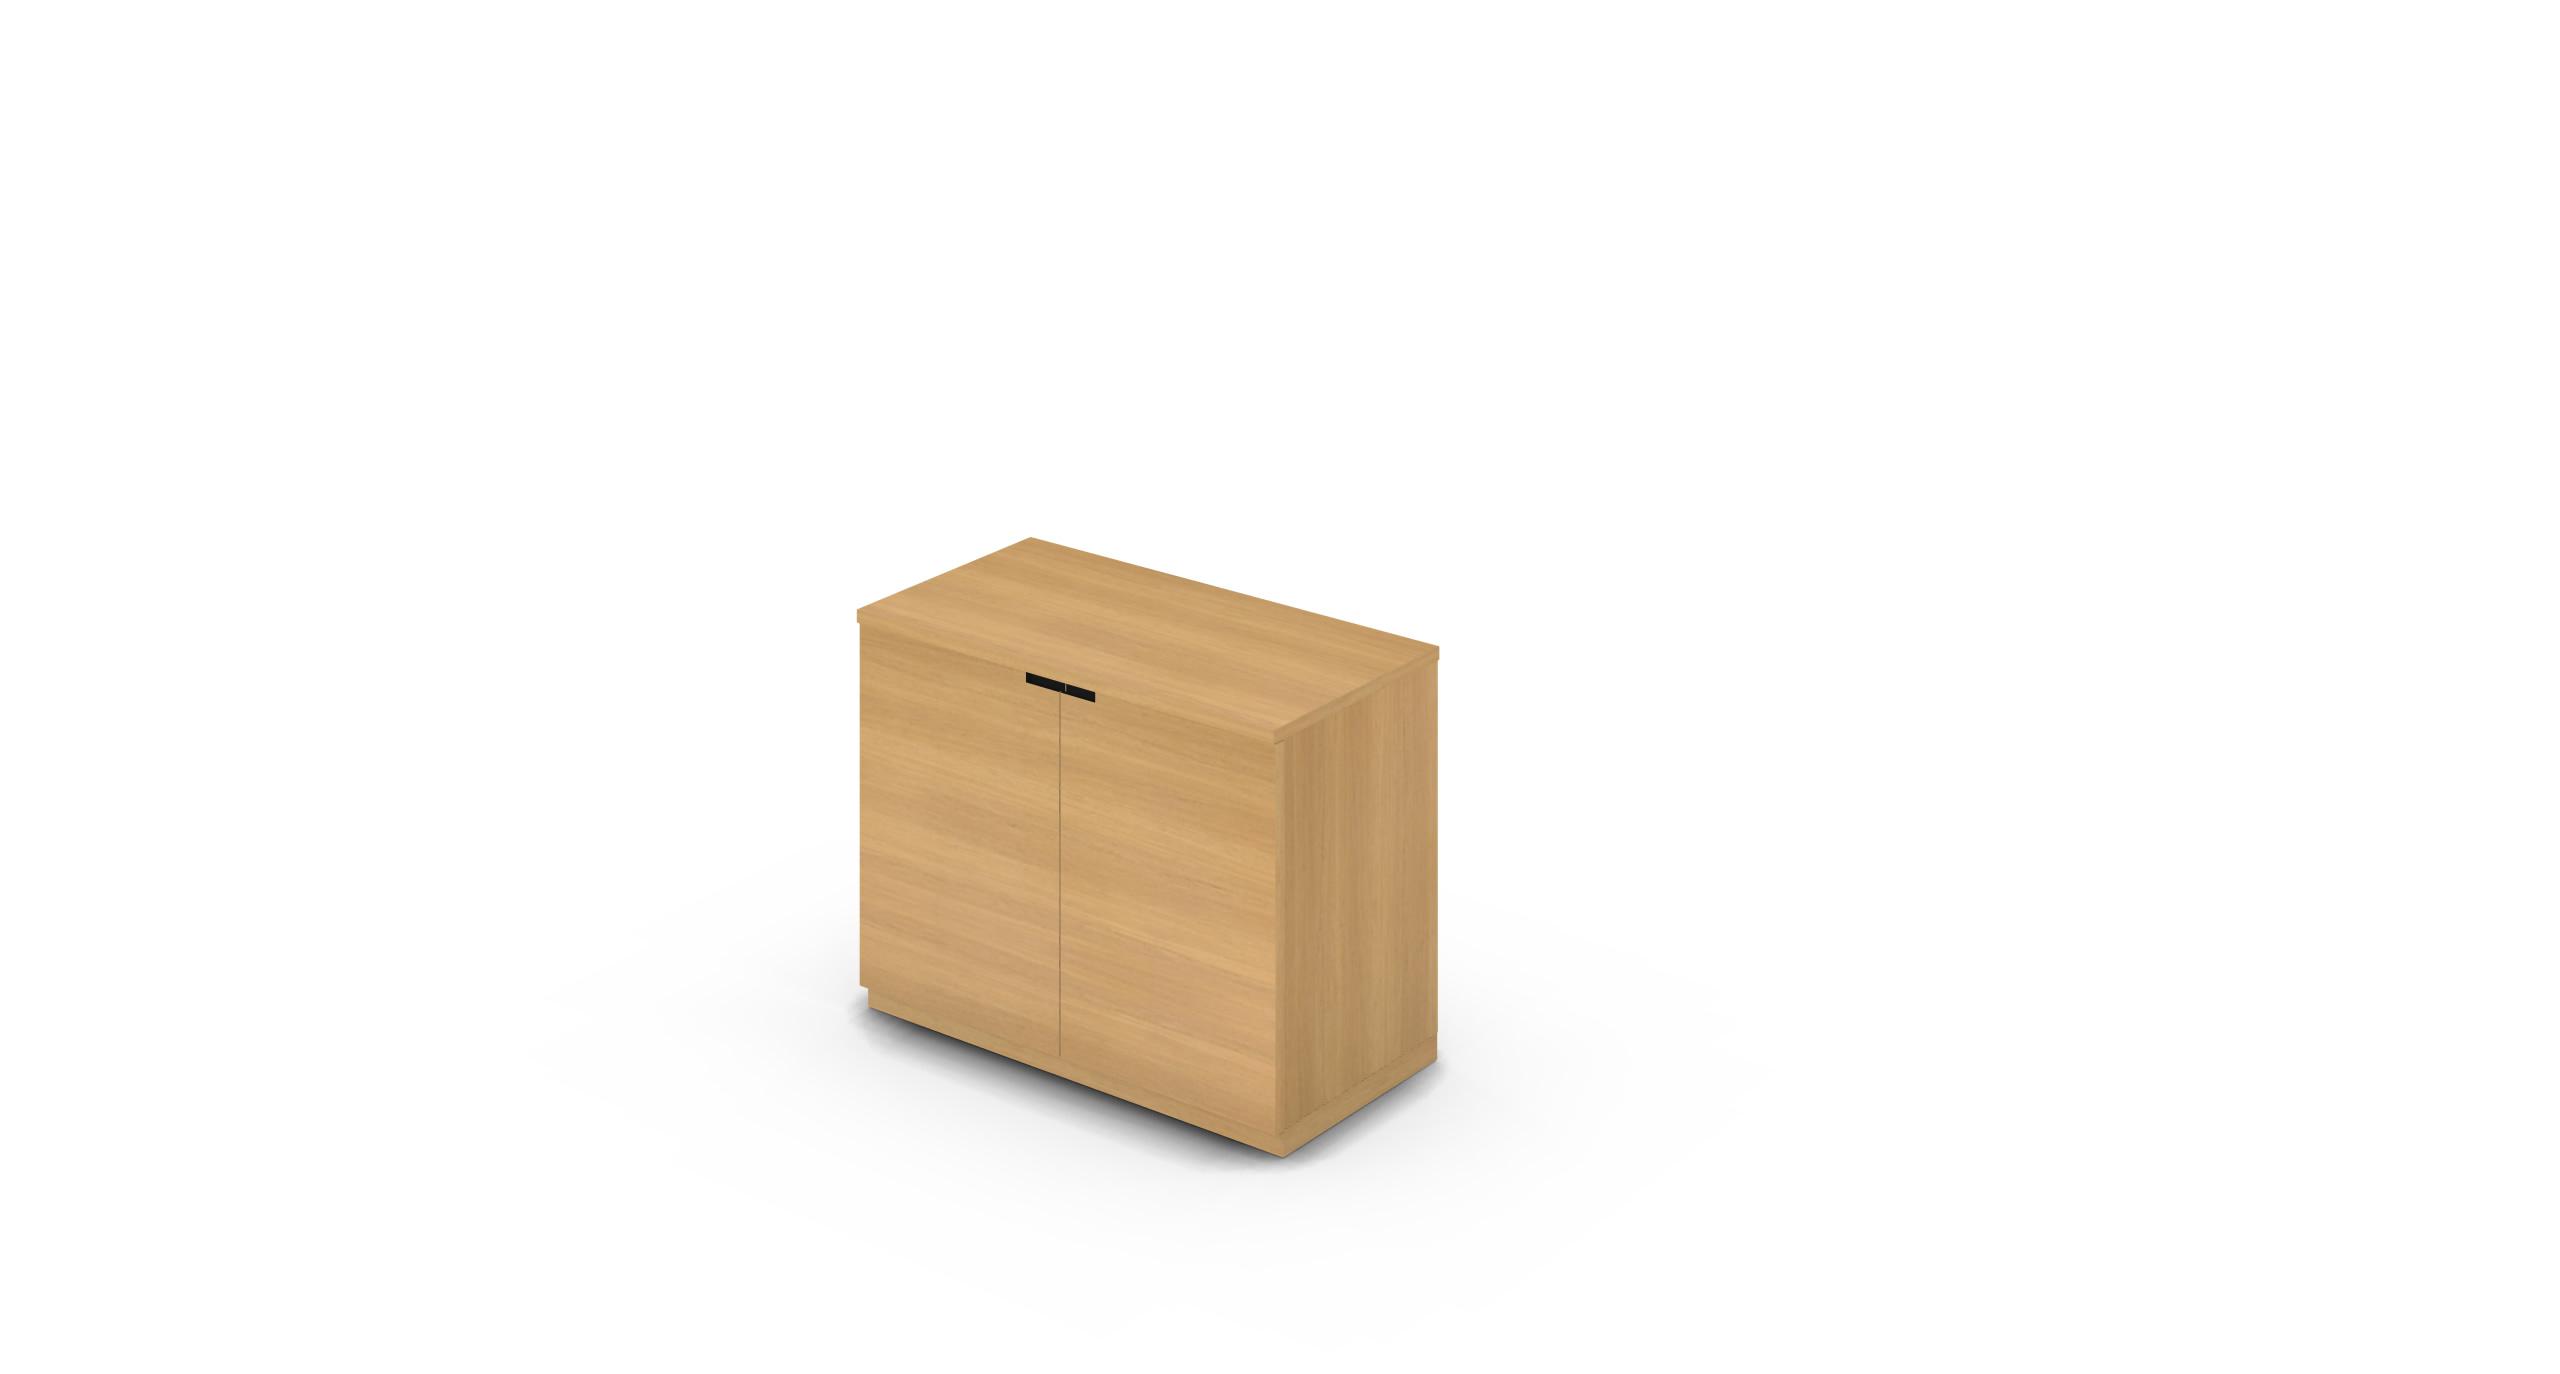 Cabinet_900x450x775_HD_Oak_CutOut_NoCylinder